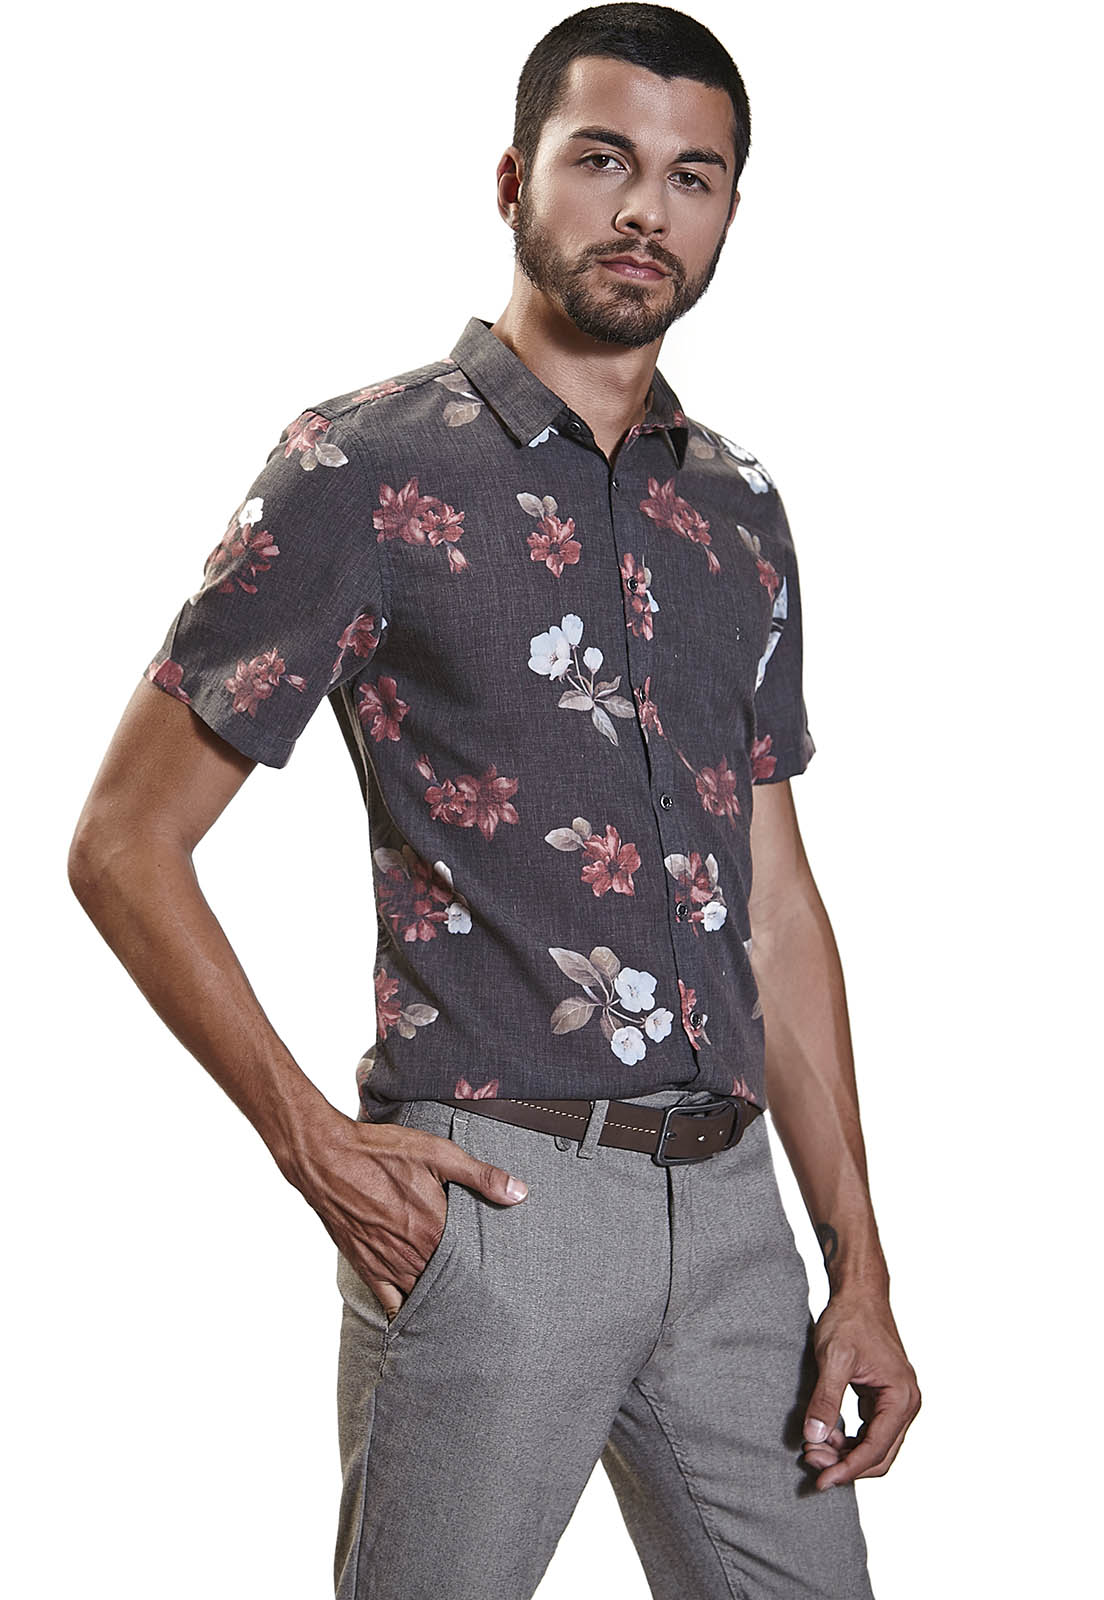 Camisa Slim Zaiko Estampada Floral Manga Curta 2256 Preto